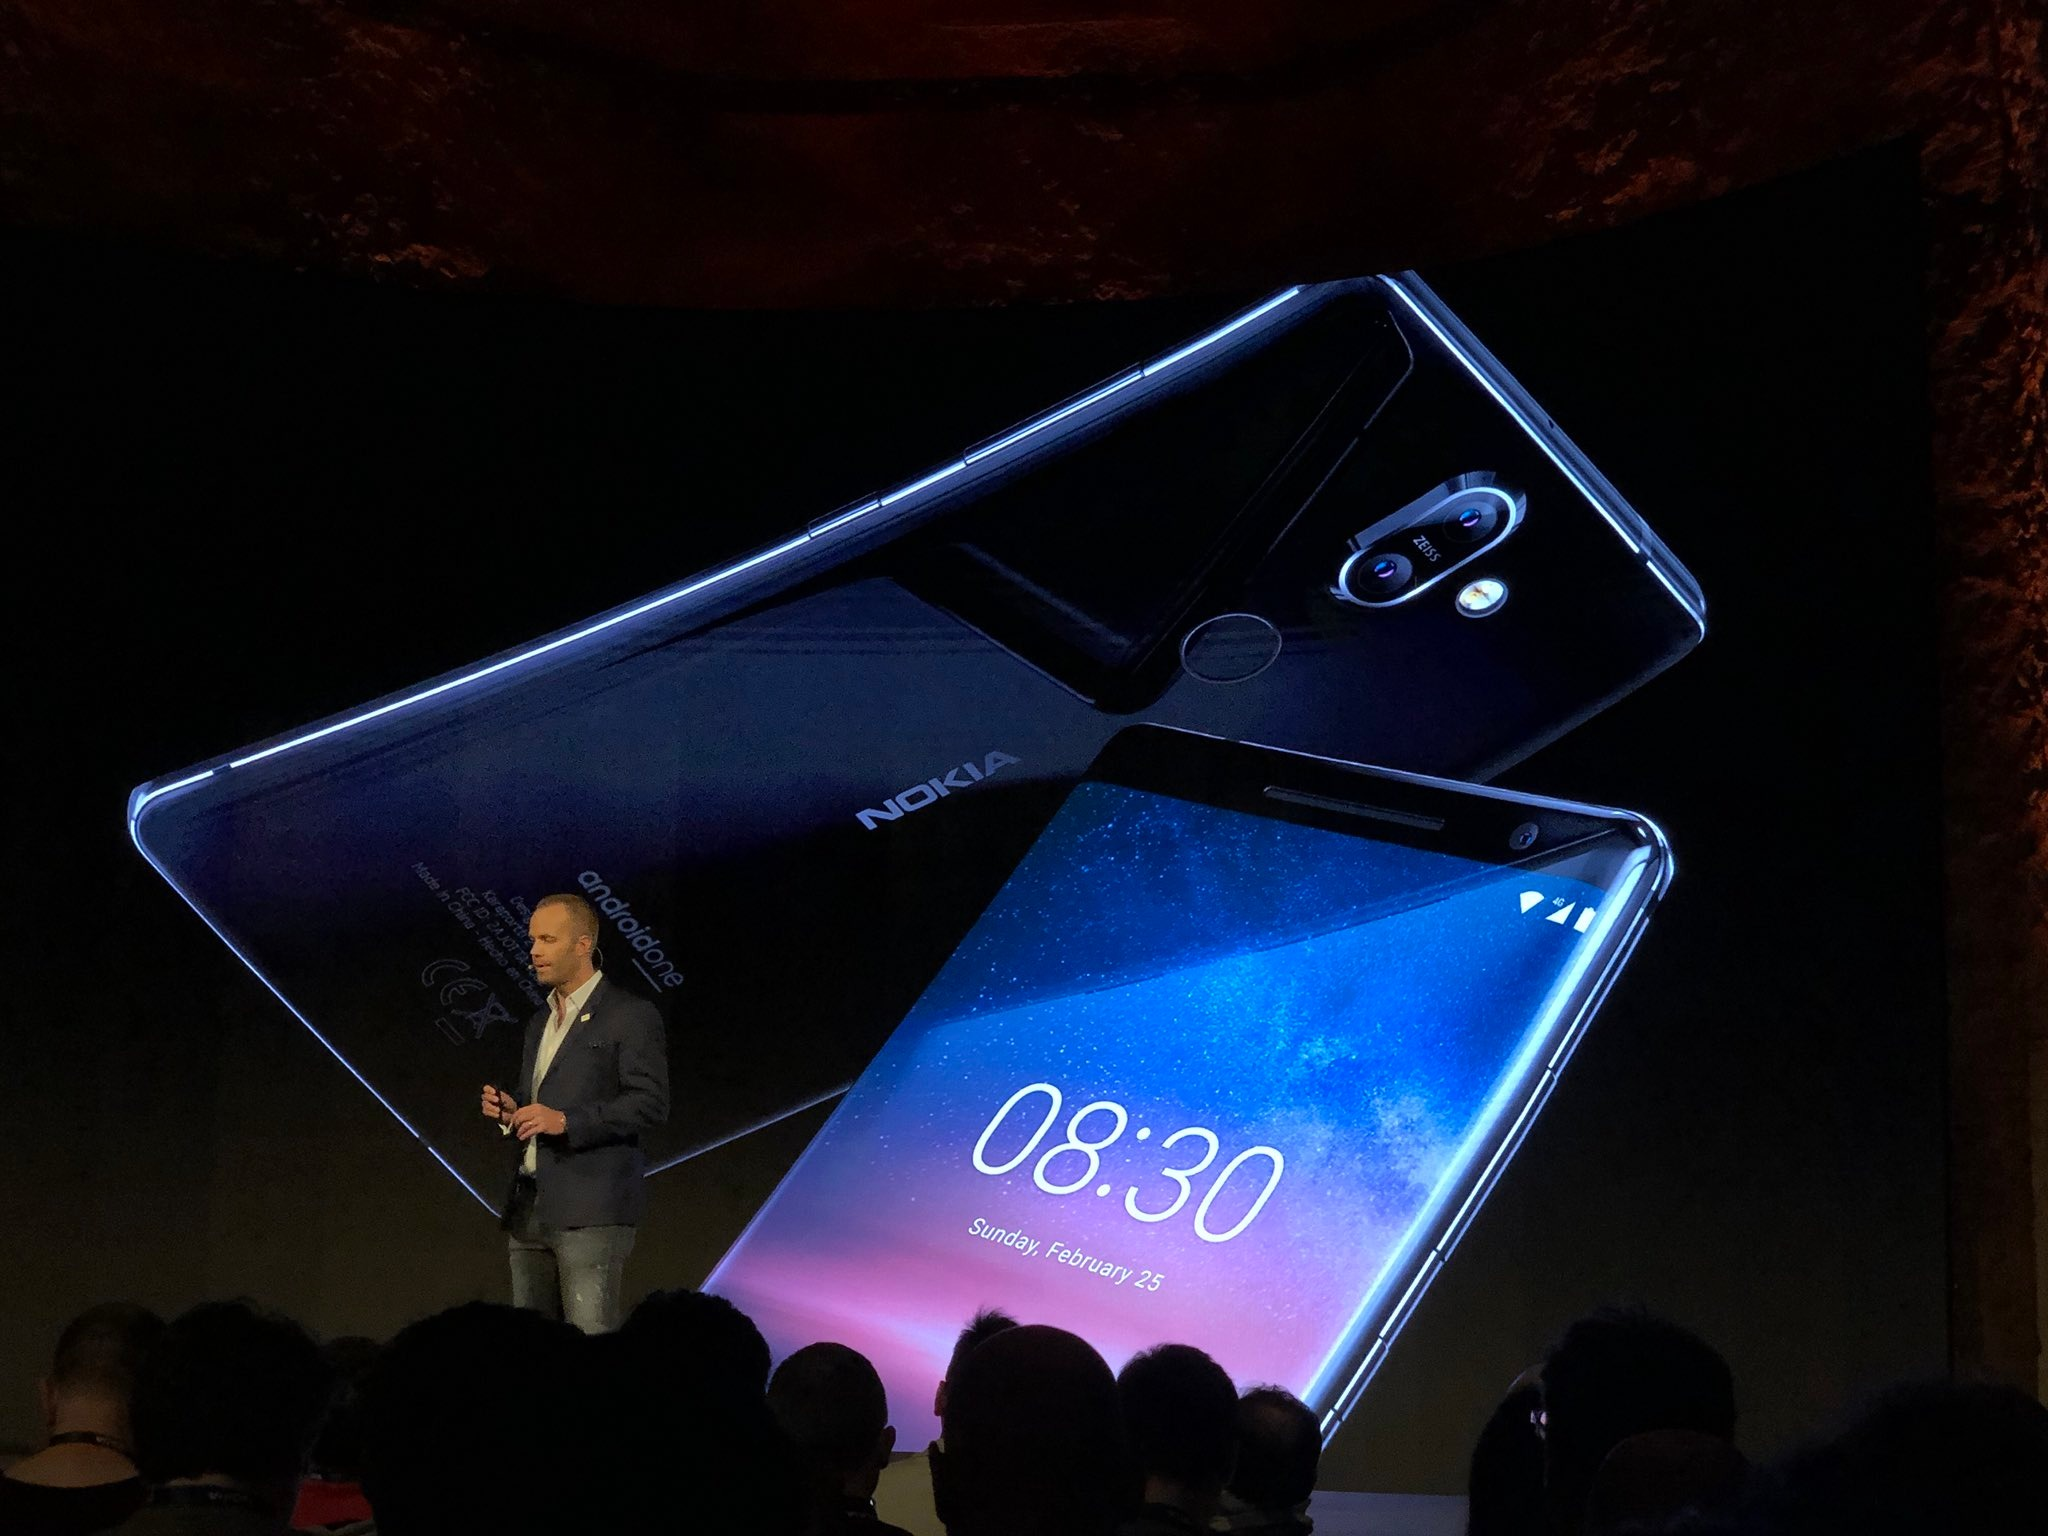 MWC, MWC 2018, Điện     thoại, HMD Global, Nokia, Nokia 8, Nokia 8 Sirocco, Cấu hình     Nokia 8 Sirocco,